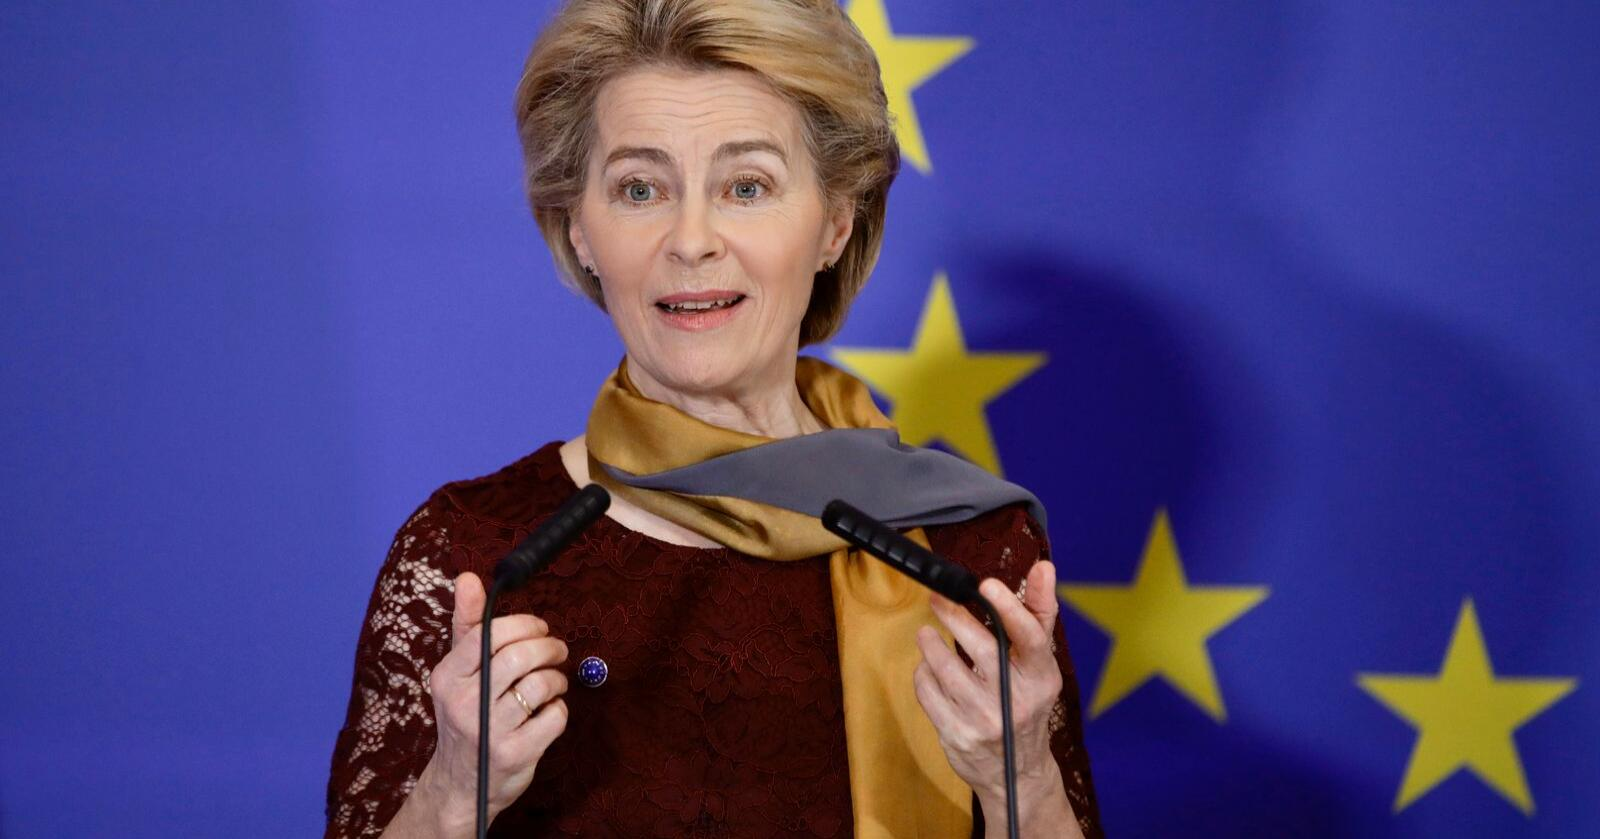 EU-kommisjonens president Ursula von der Leyen tok formelt over styringen søndag. Foto: AP / Olivier Matthys / NTB scanpix